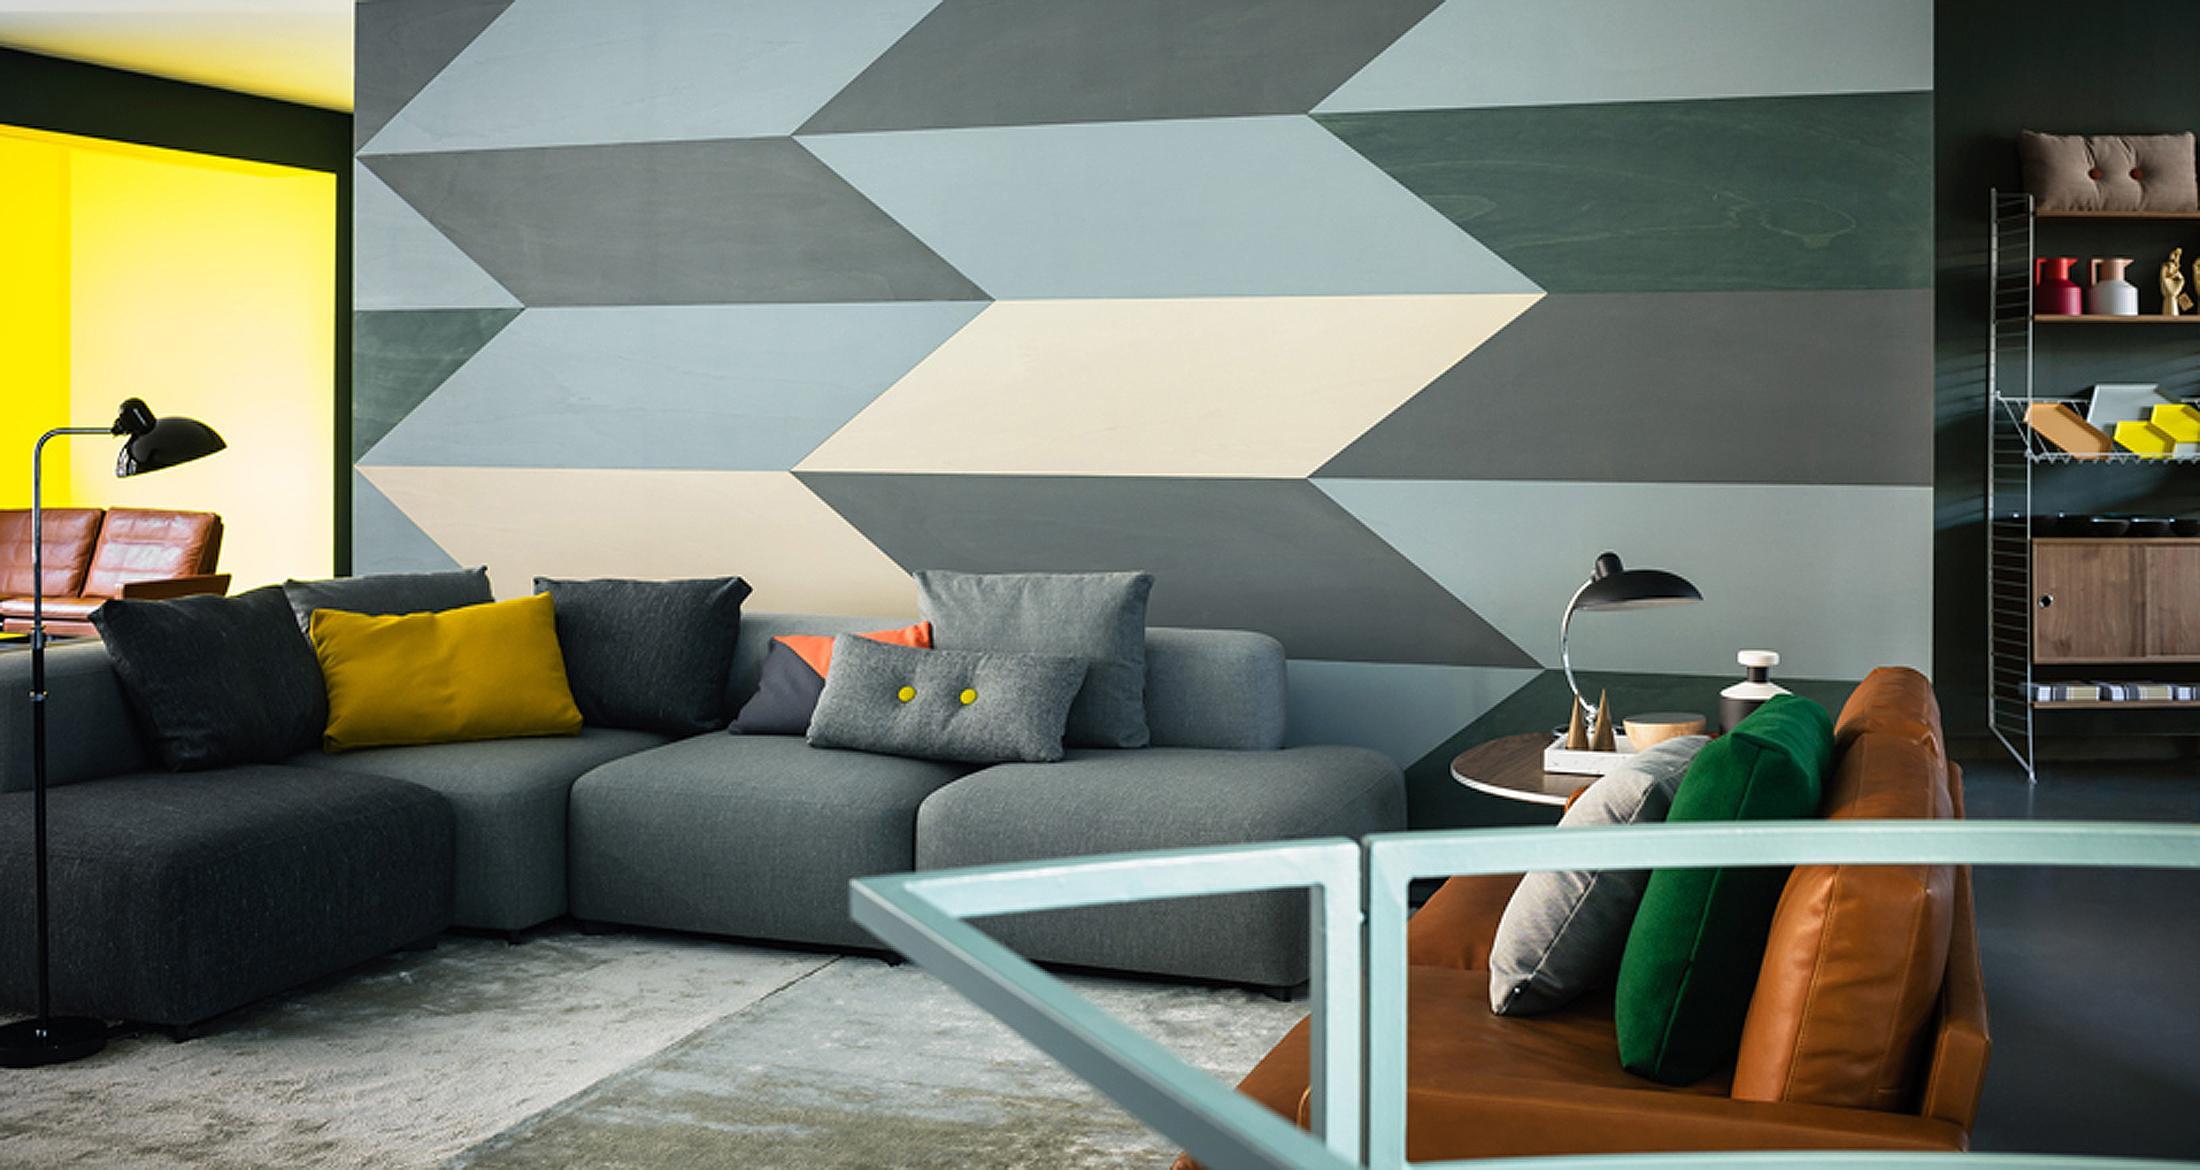 Geometrisches Muster Als Wandgestaltung Retro Lede